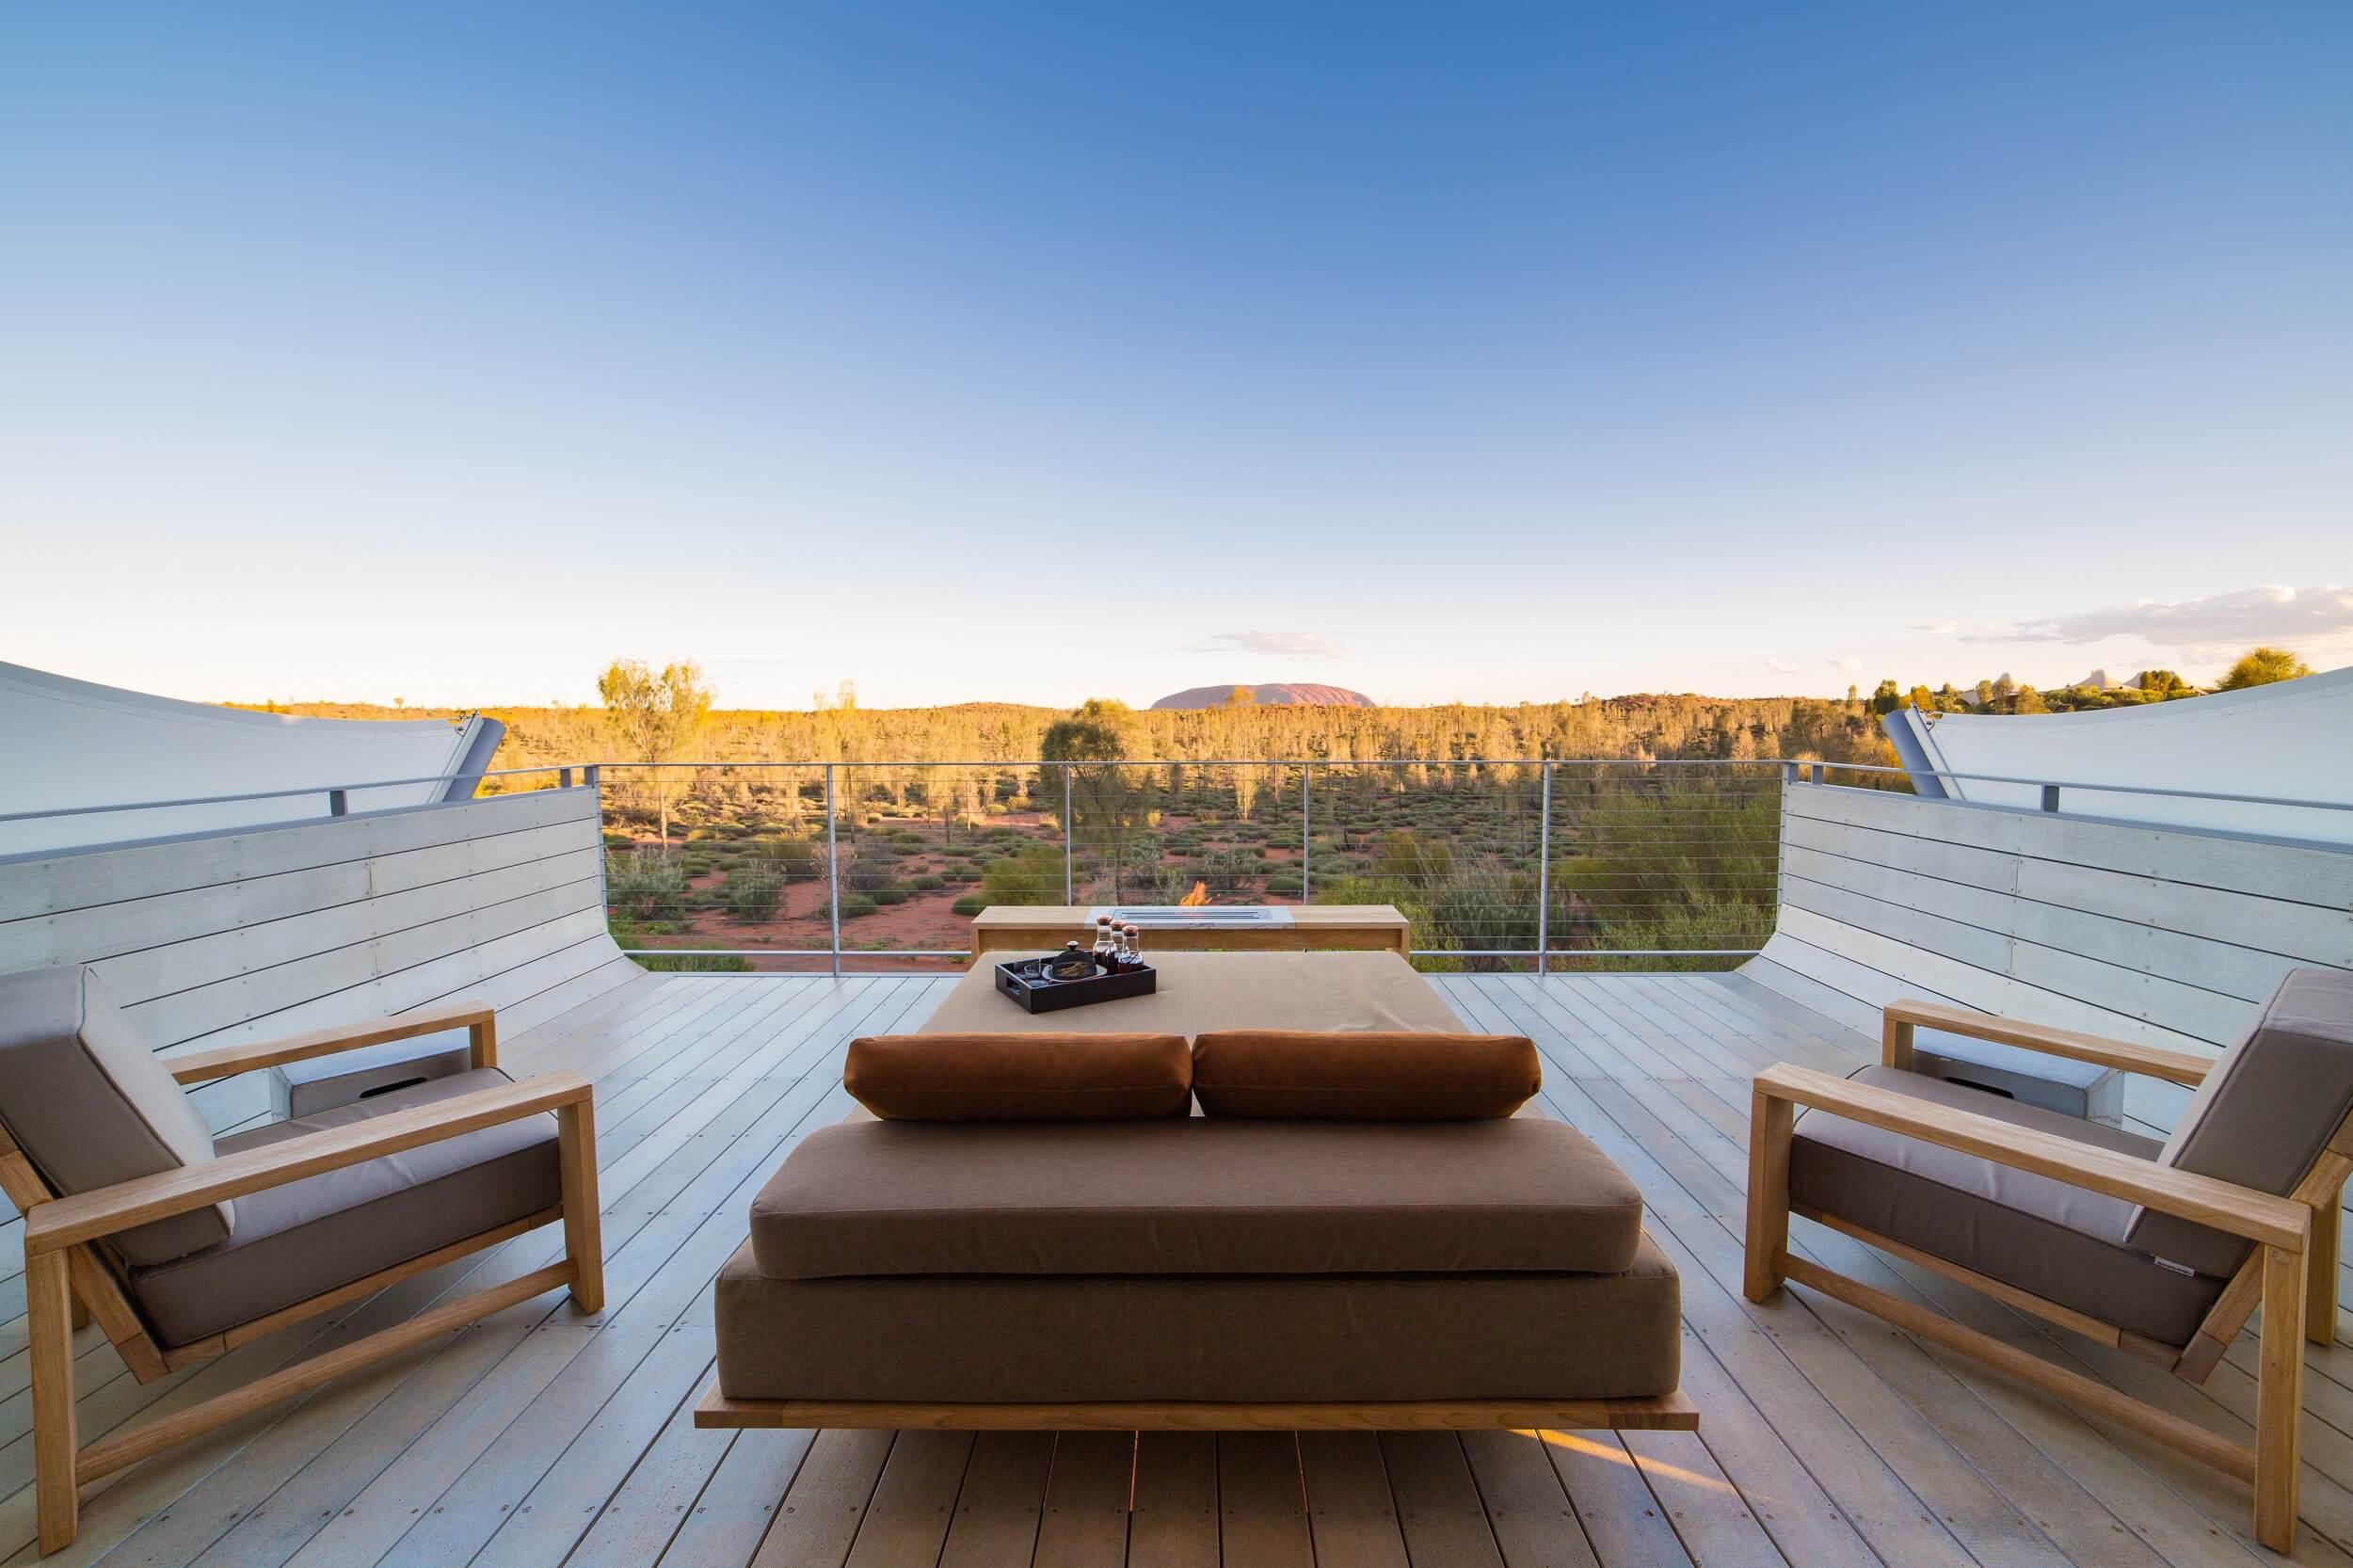 Longitude-131_Ayers-Rock-Uluru_Balcony-Views.jpg